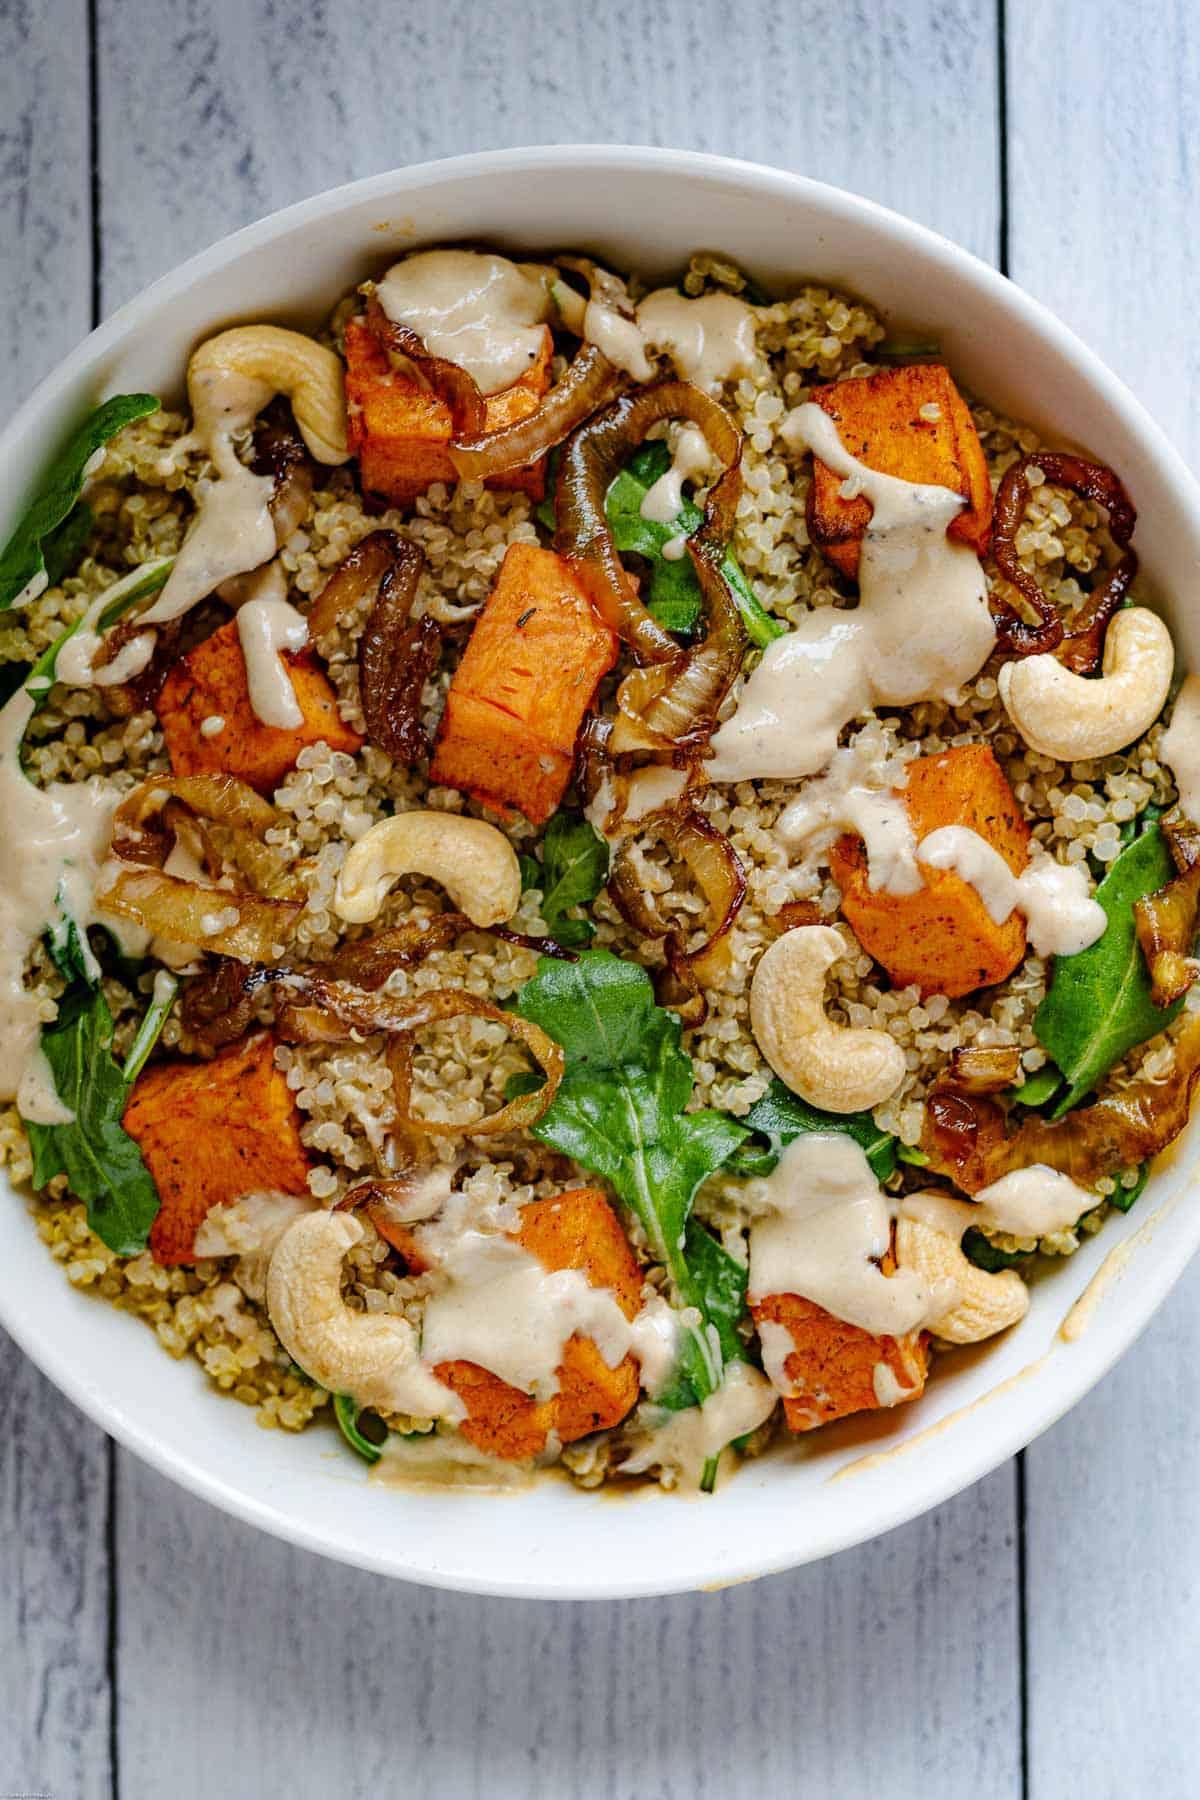 Sweet Potato & Quinoa Salad with Tahini in a white bowl.